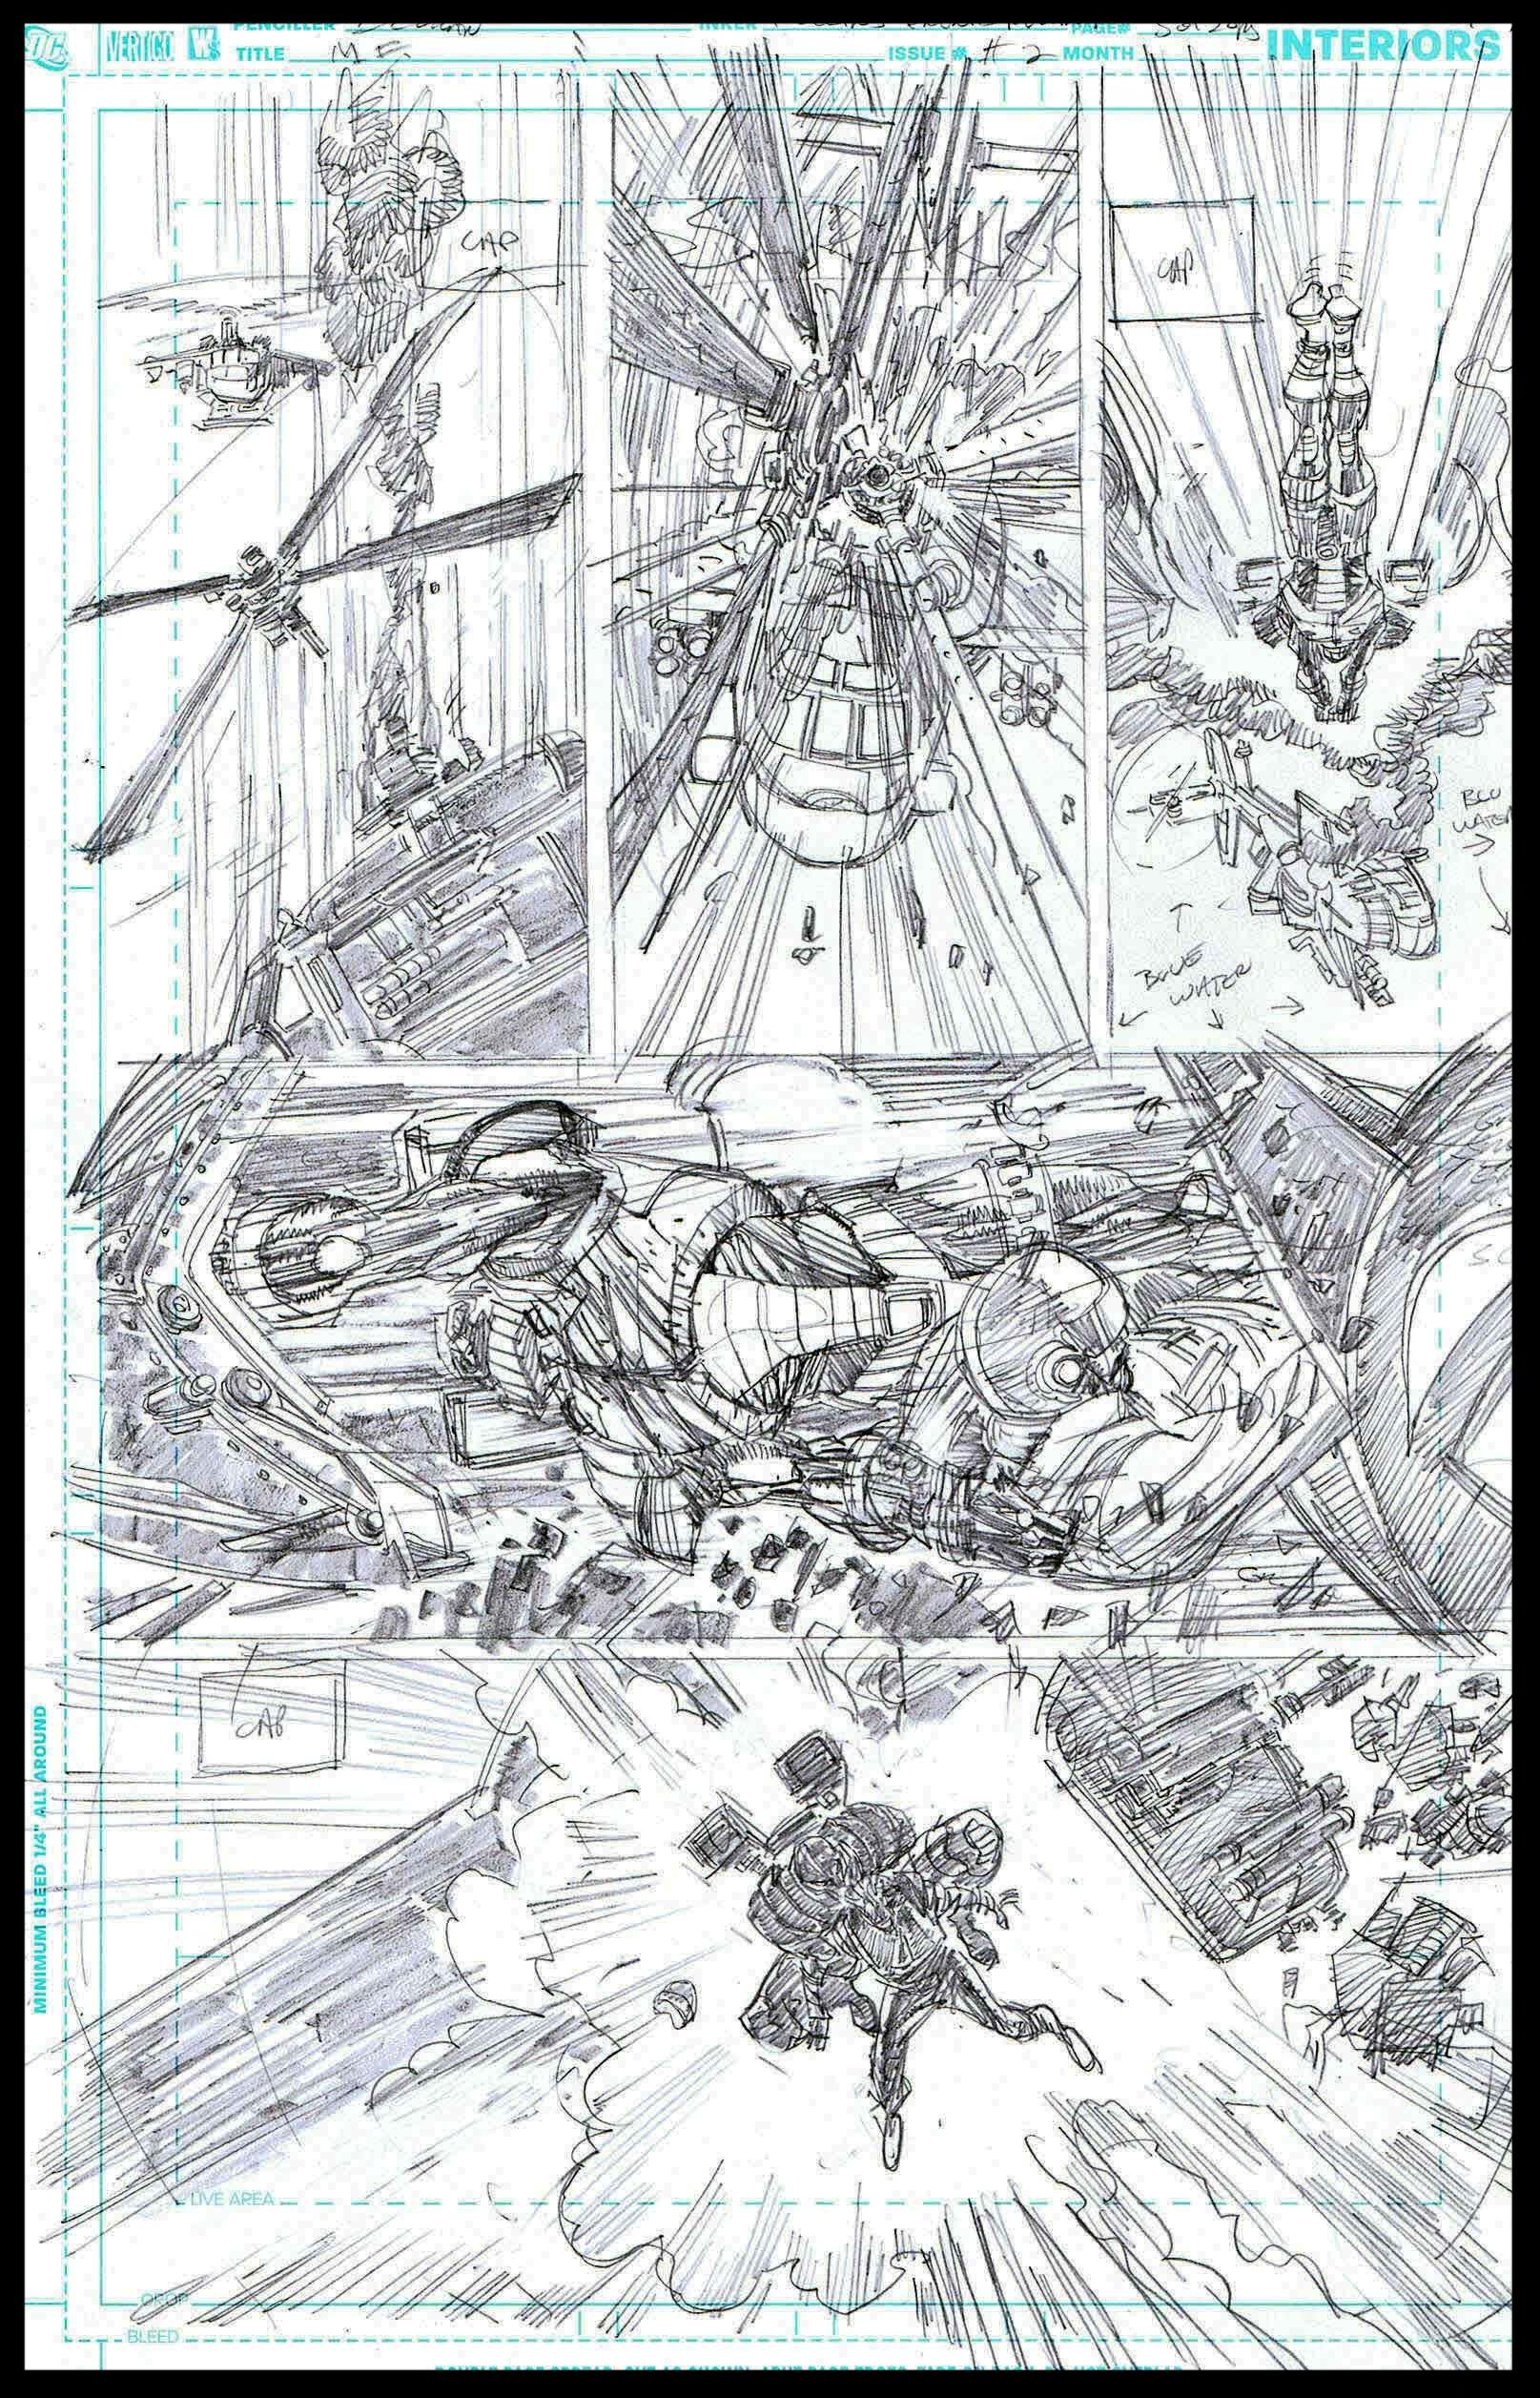 Hardware #2 - Page 5 - Pencils